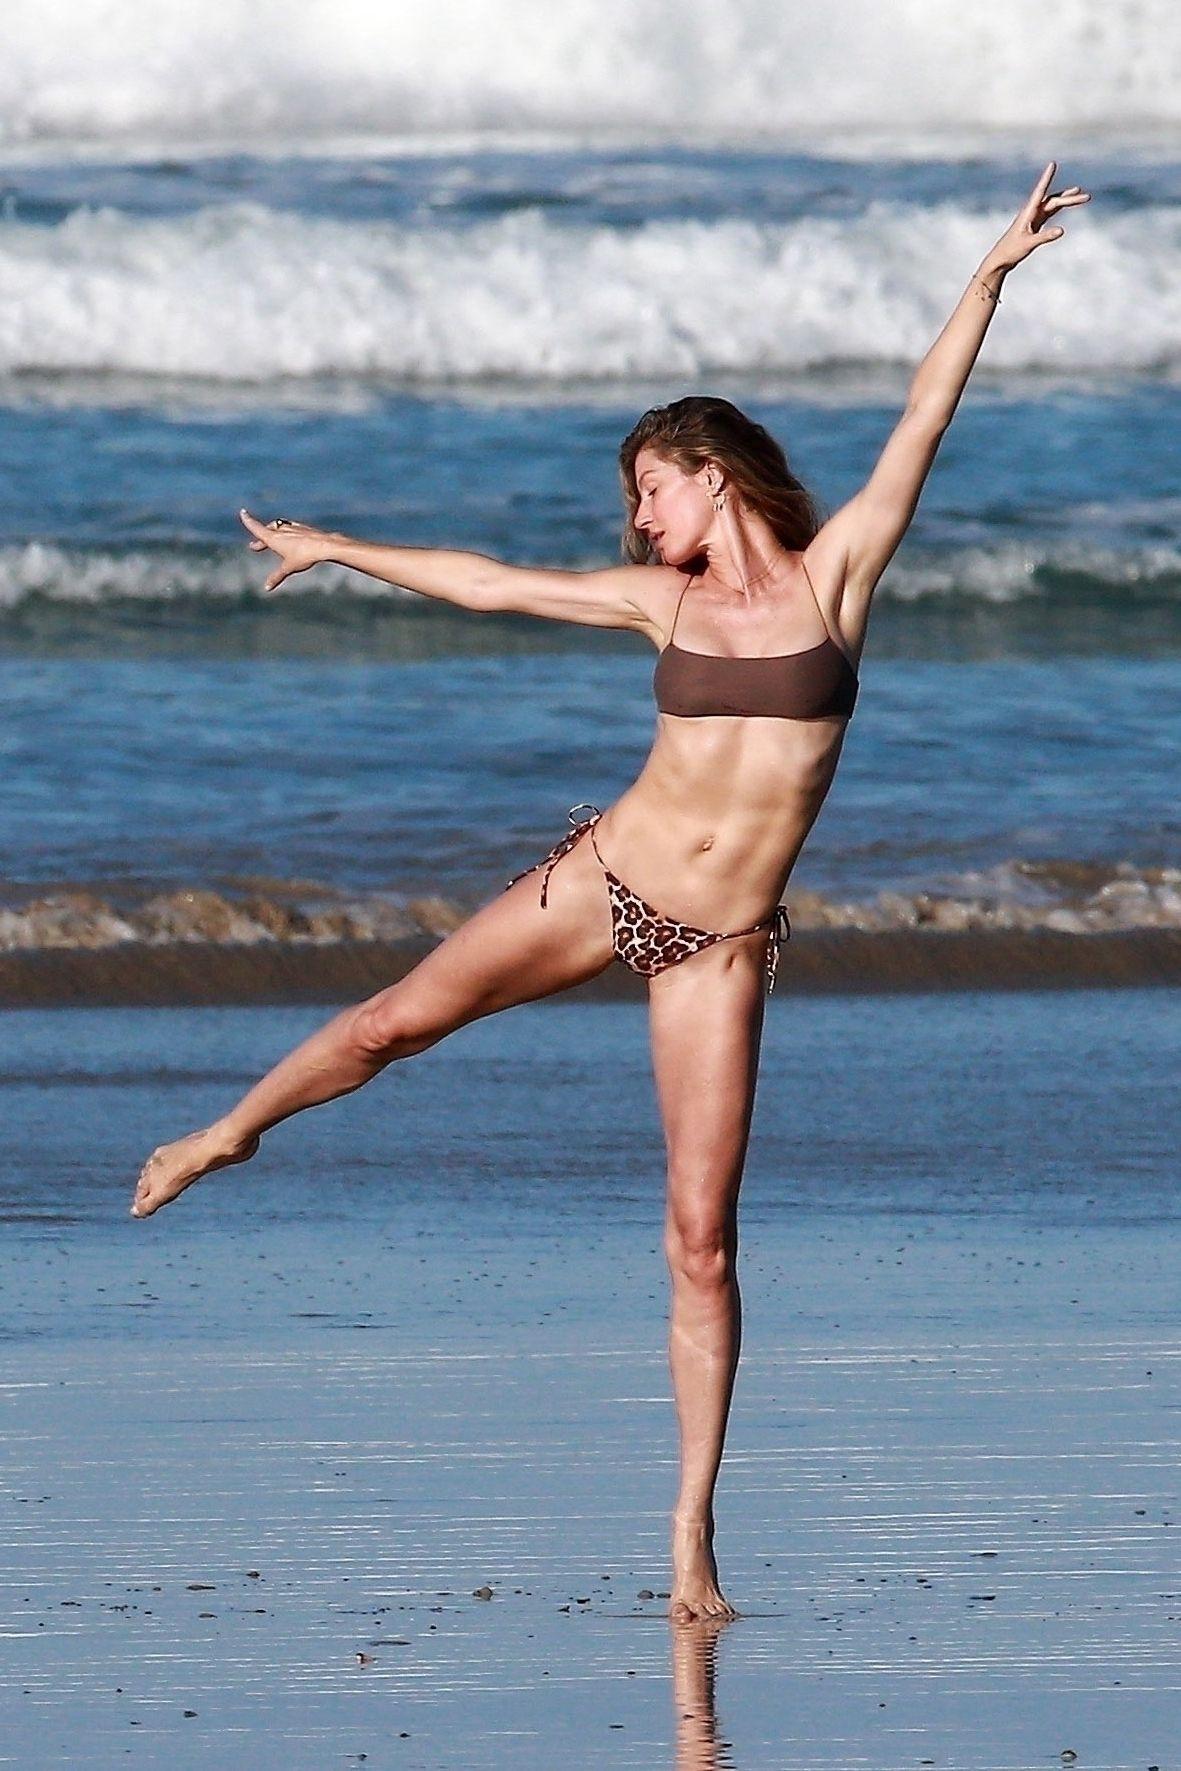 Gisele Bundchen Puts Her Incredible Bikini Body On Display During A Beach Photoshoot 0016